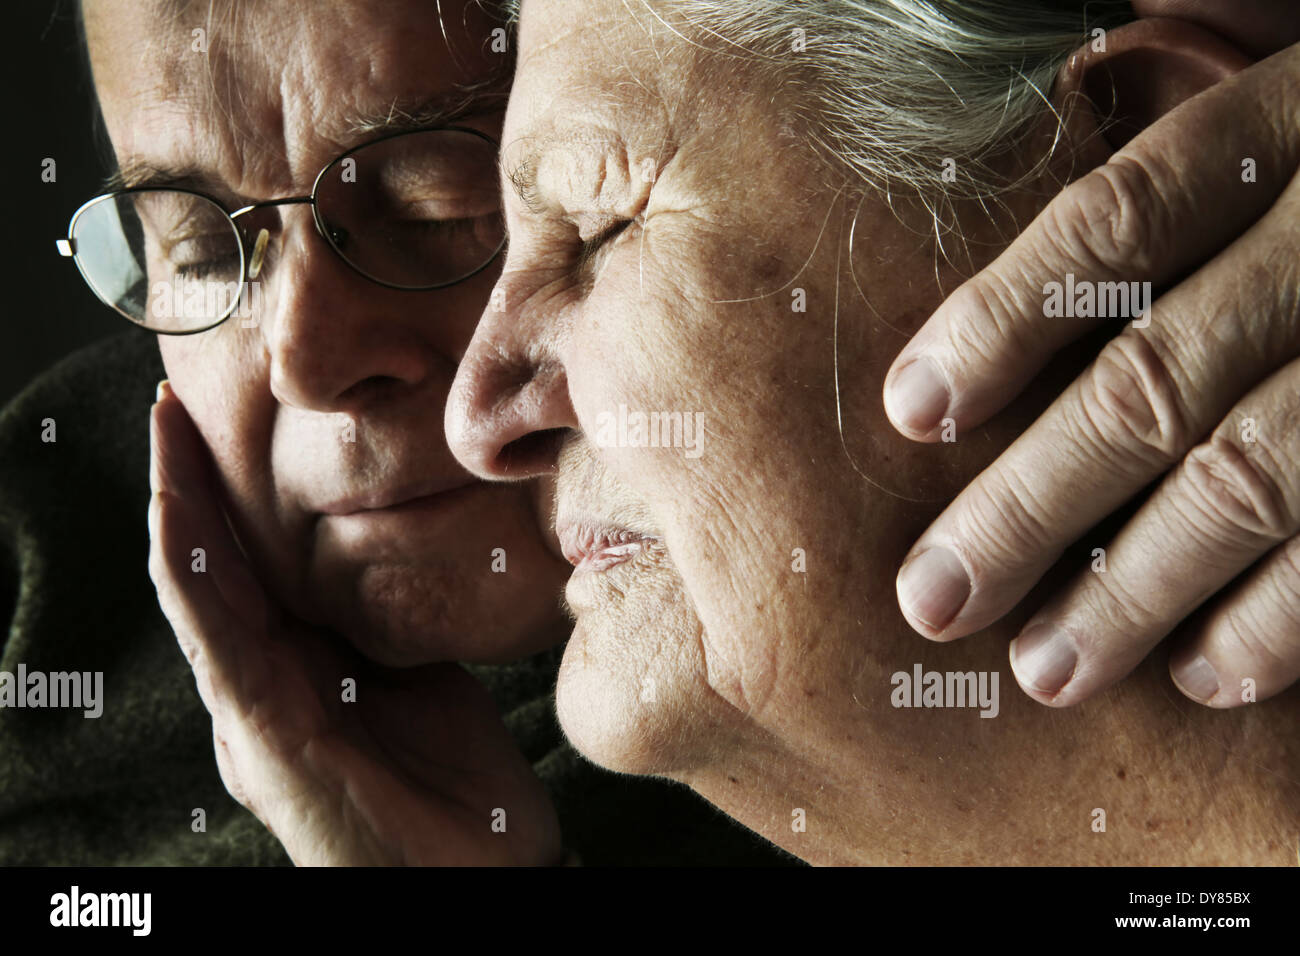 Porträt von älteres Paar mit enge Augen, Nahaufnahme Stockbild